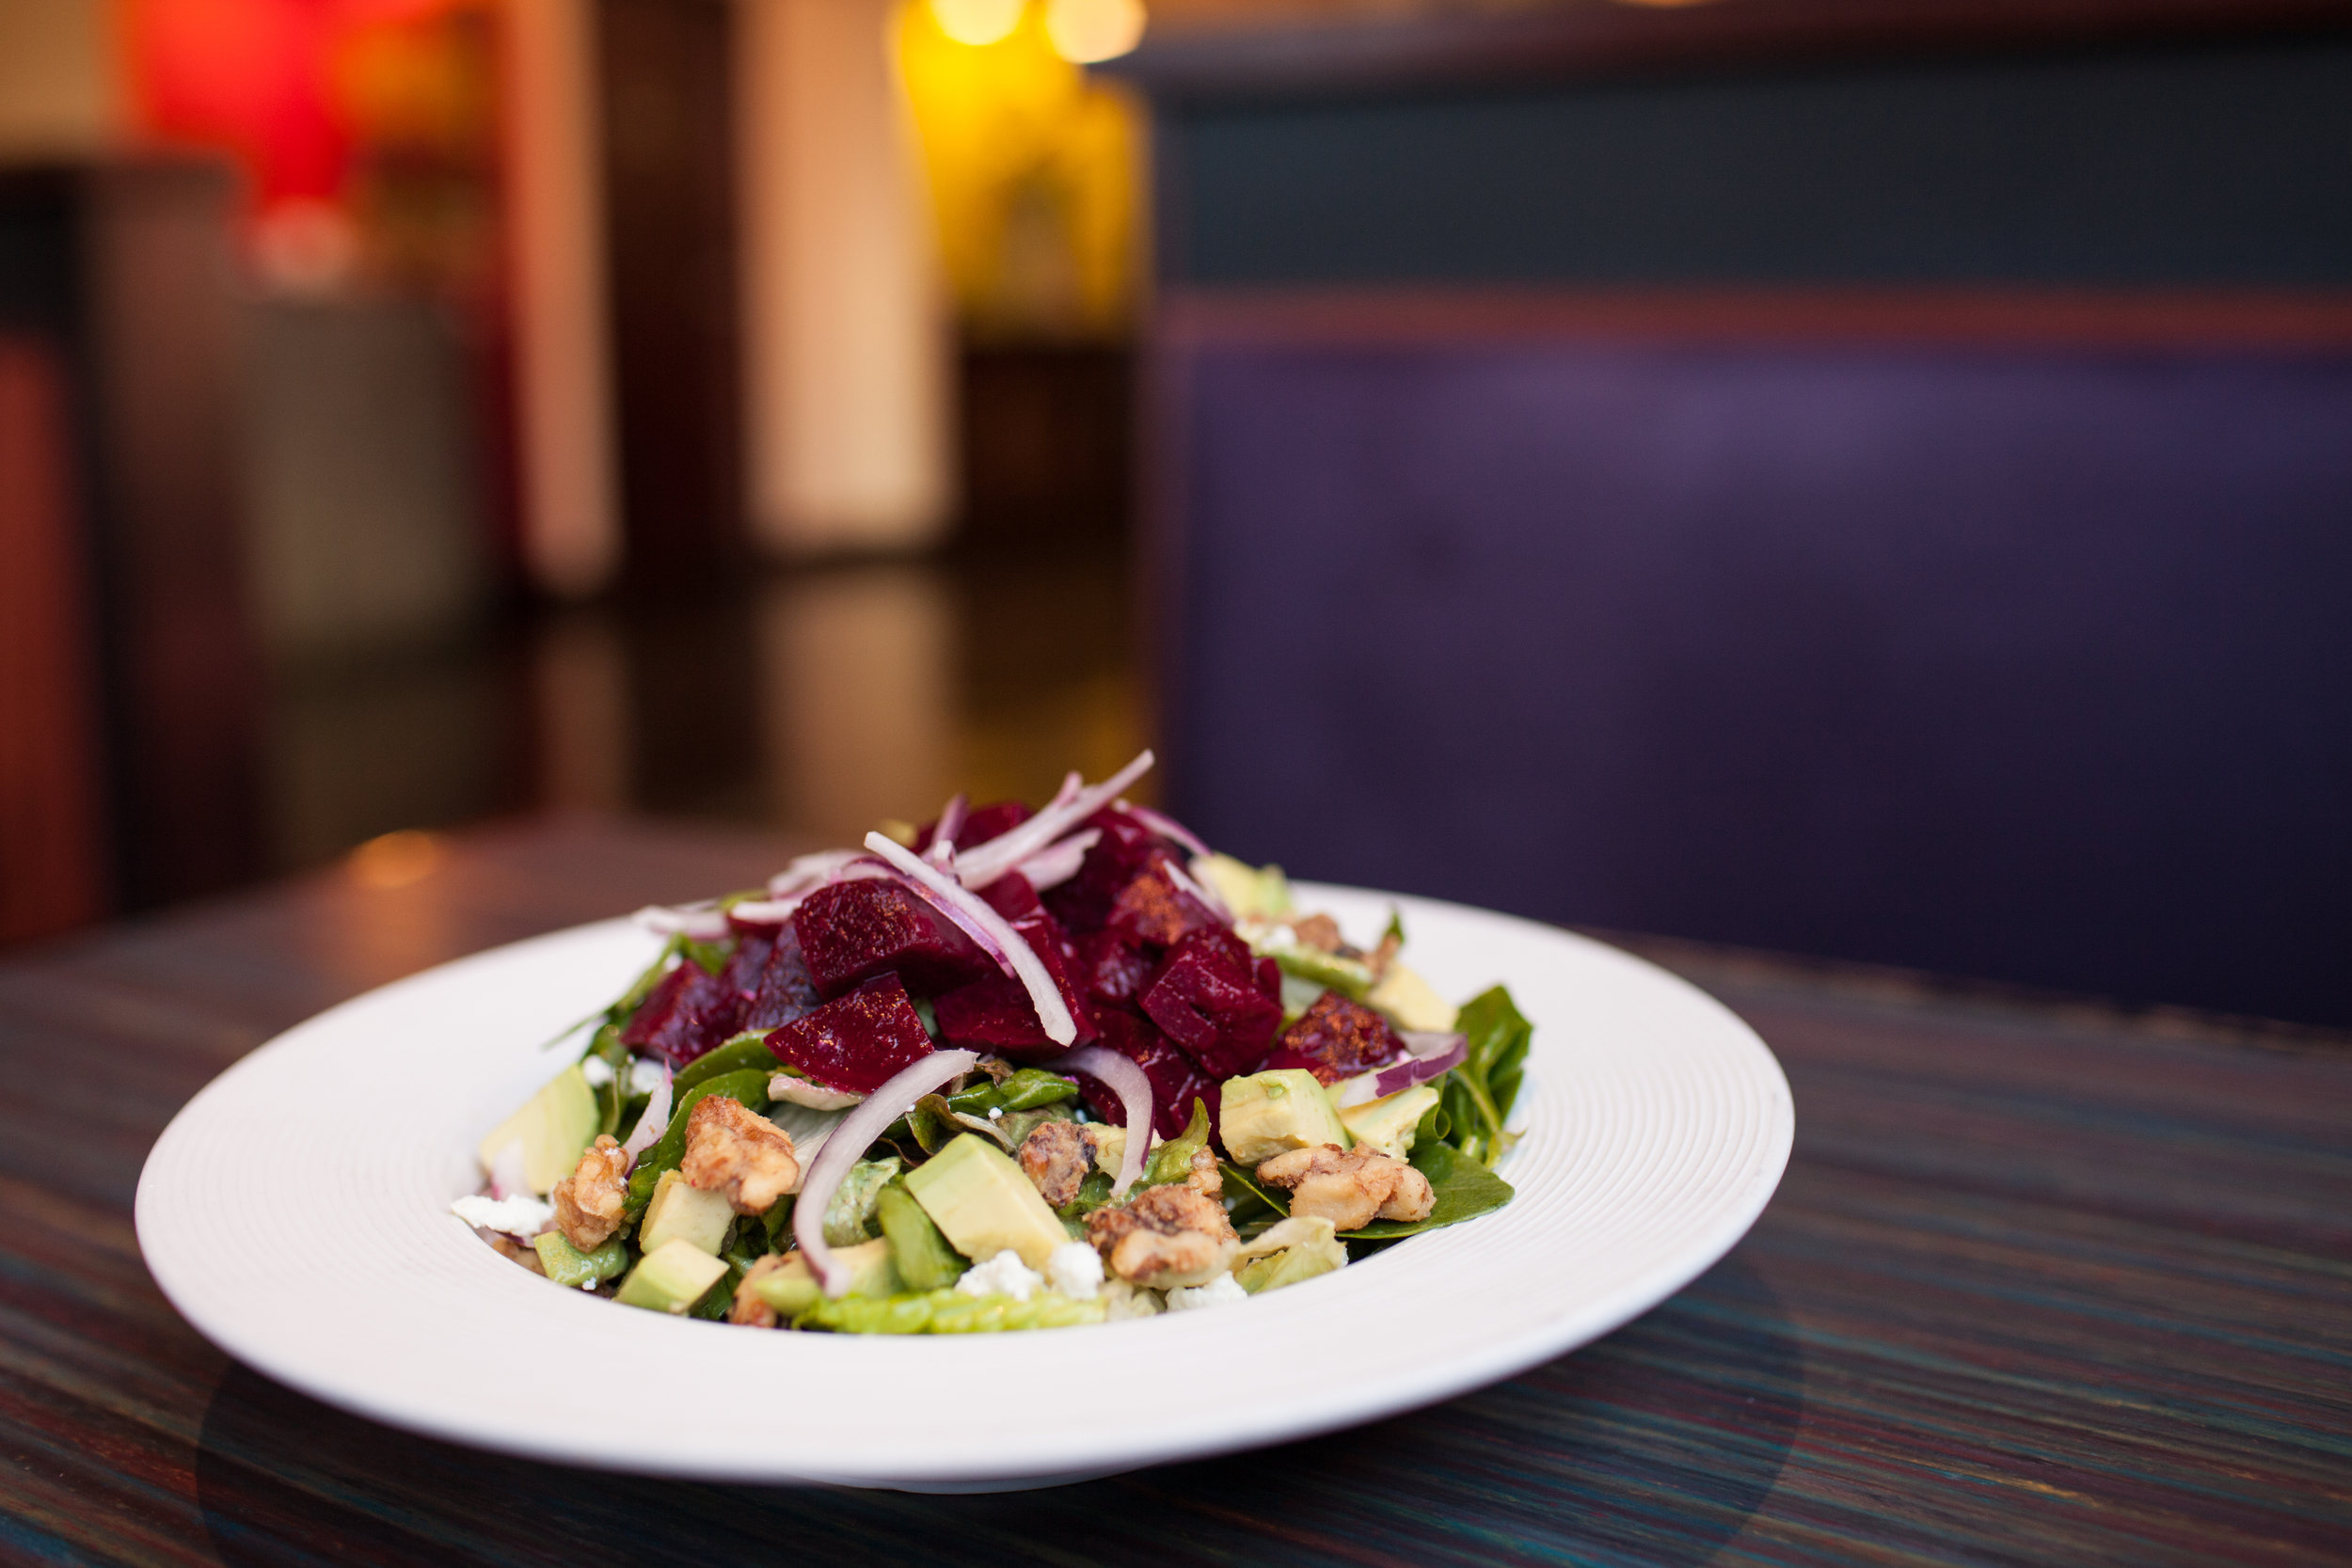 beet salad3.jpg